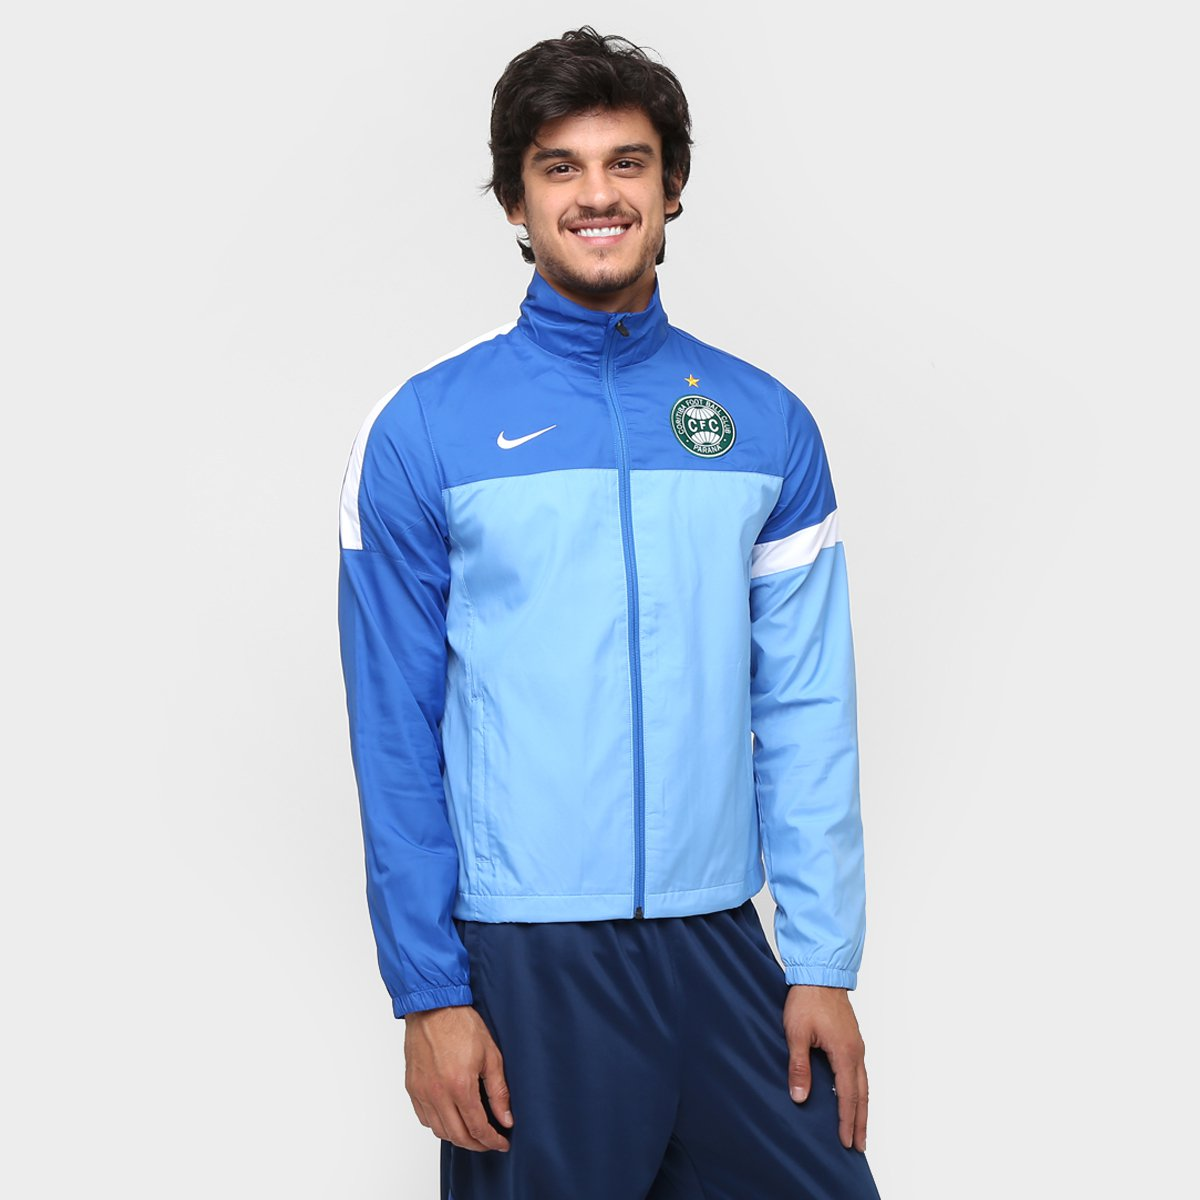 Jaqueta Nike Coritiba Treino 13 14 - Compre Agora  1a923ded0d206